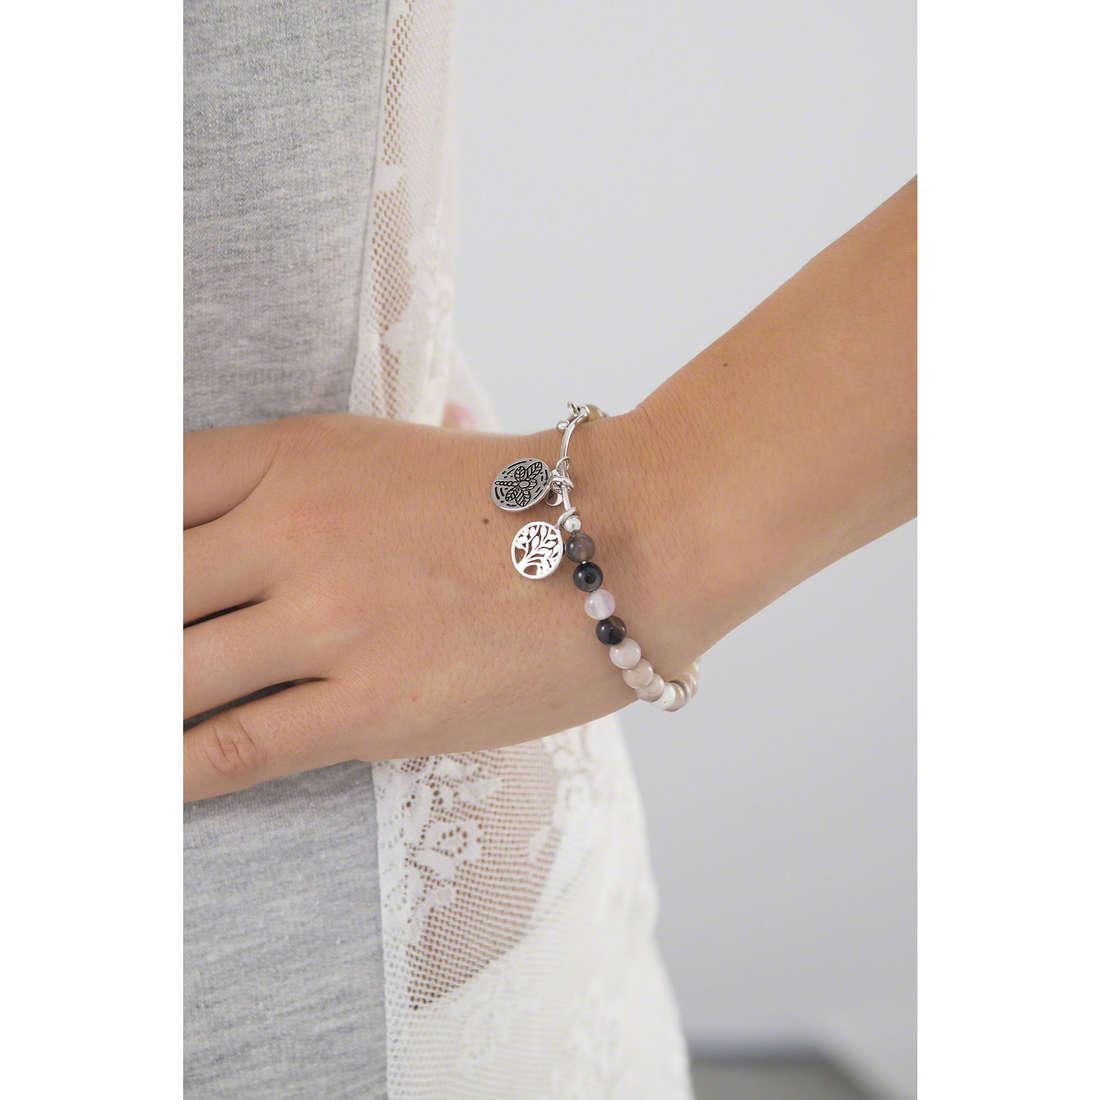 Chrysalis bracciali donna CRBH0002BO indosso